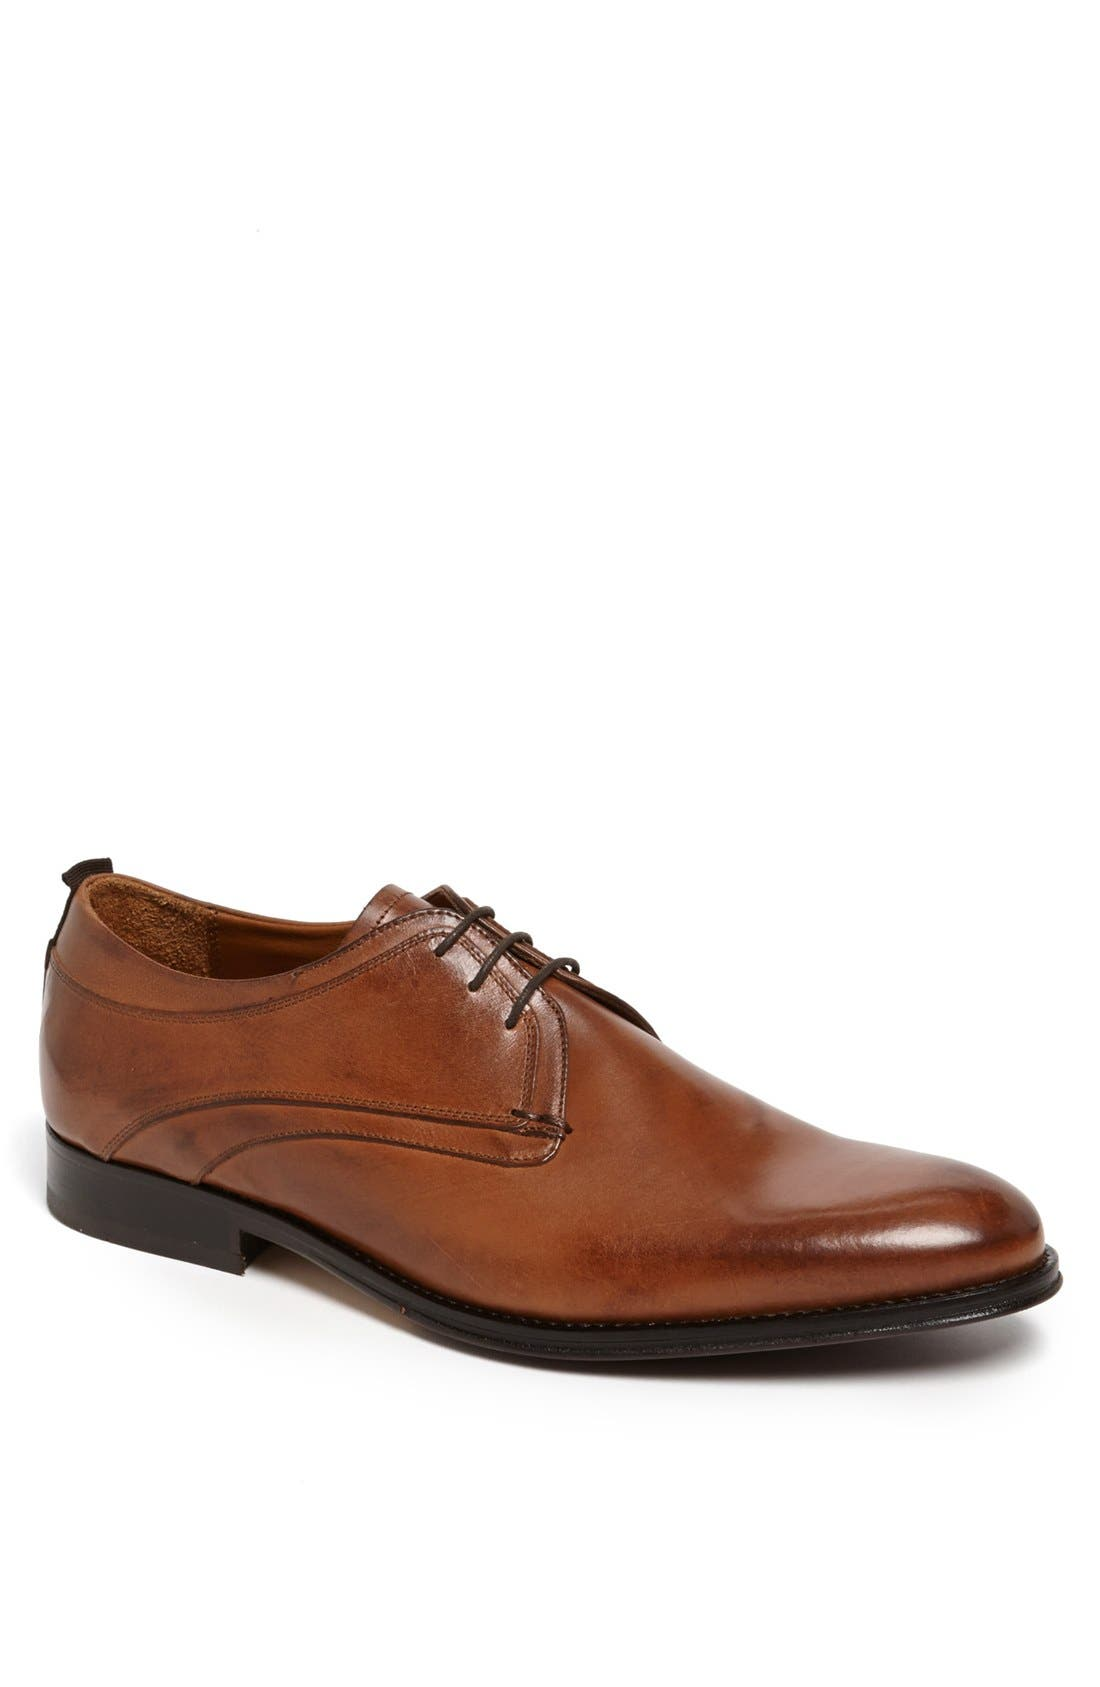 Alternate Image 1 Selected - ALDO 'Tumma' Plain Toe Derby (Men)